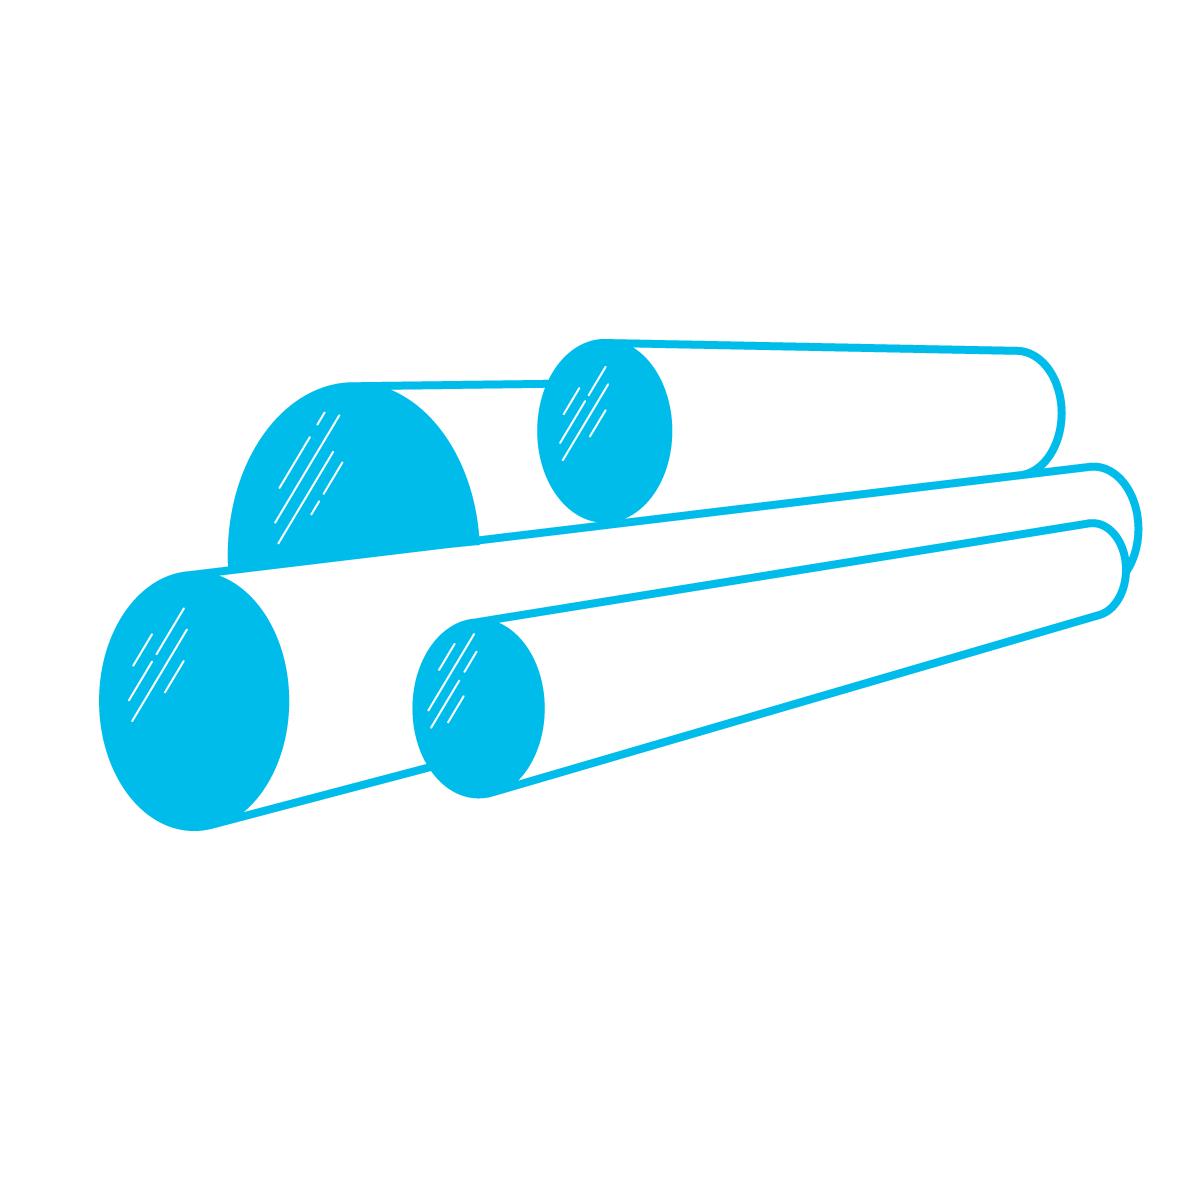 Lustercraft Plastics Plastic Rod